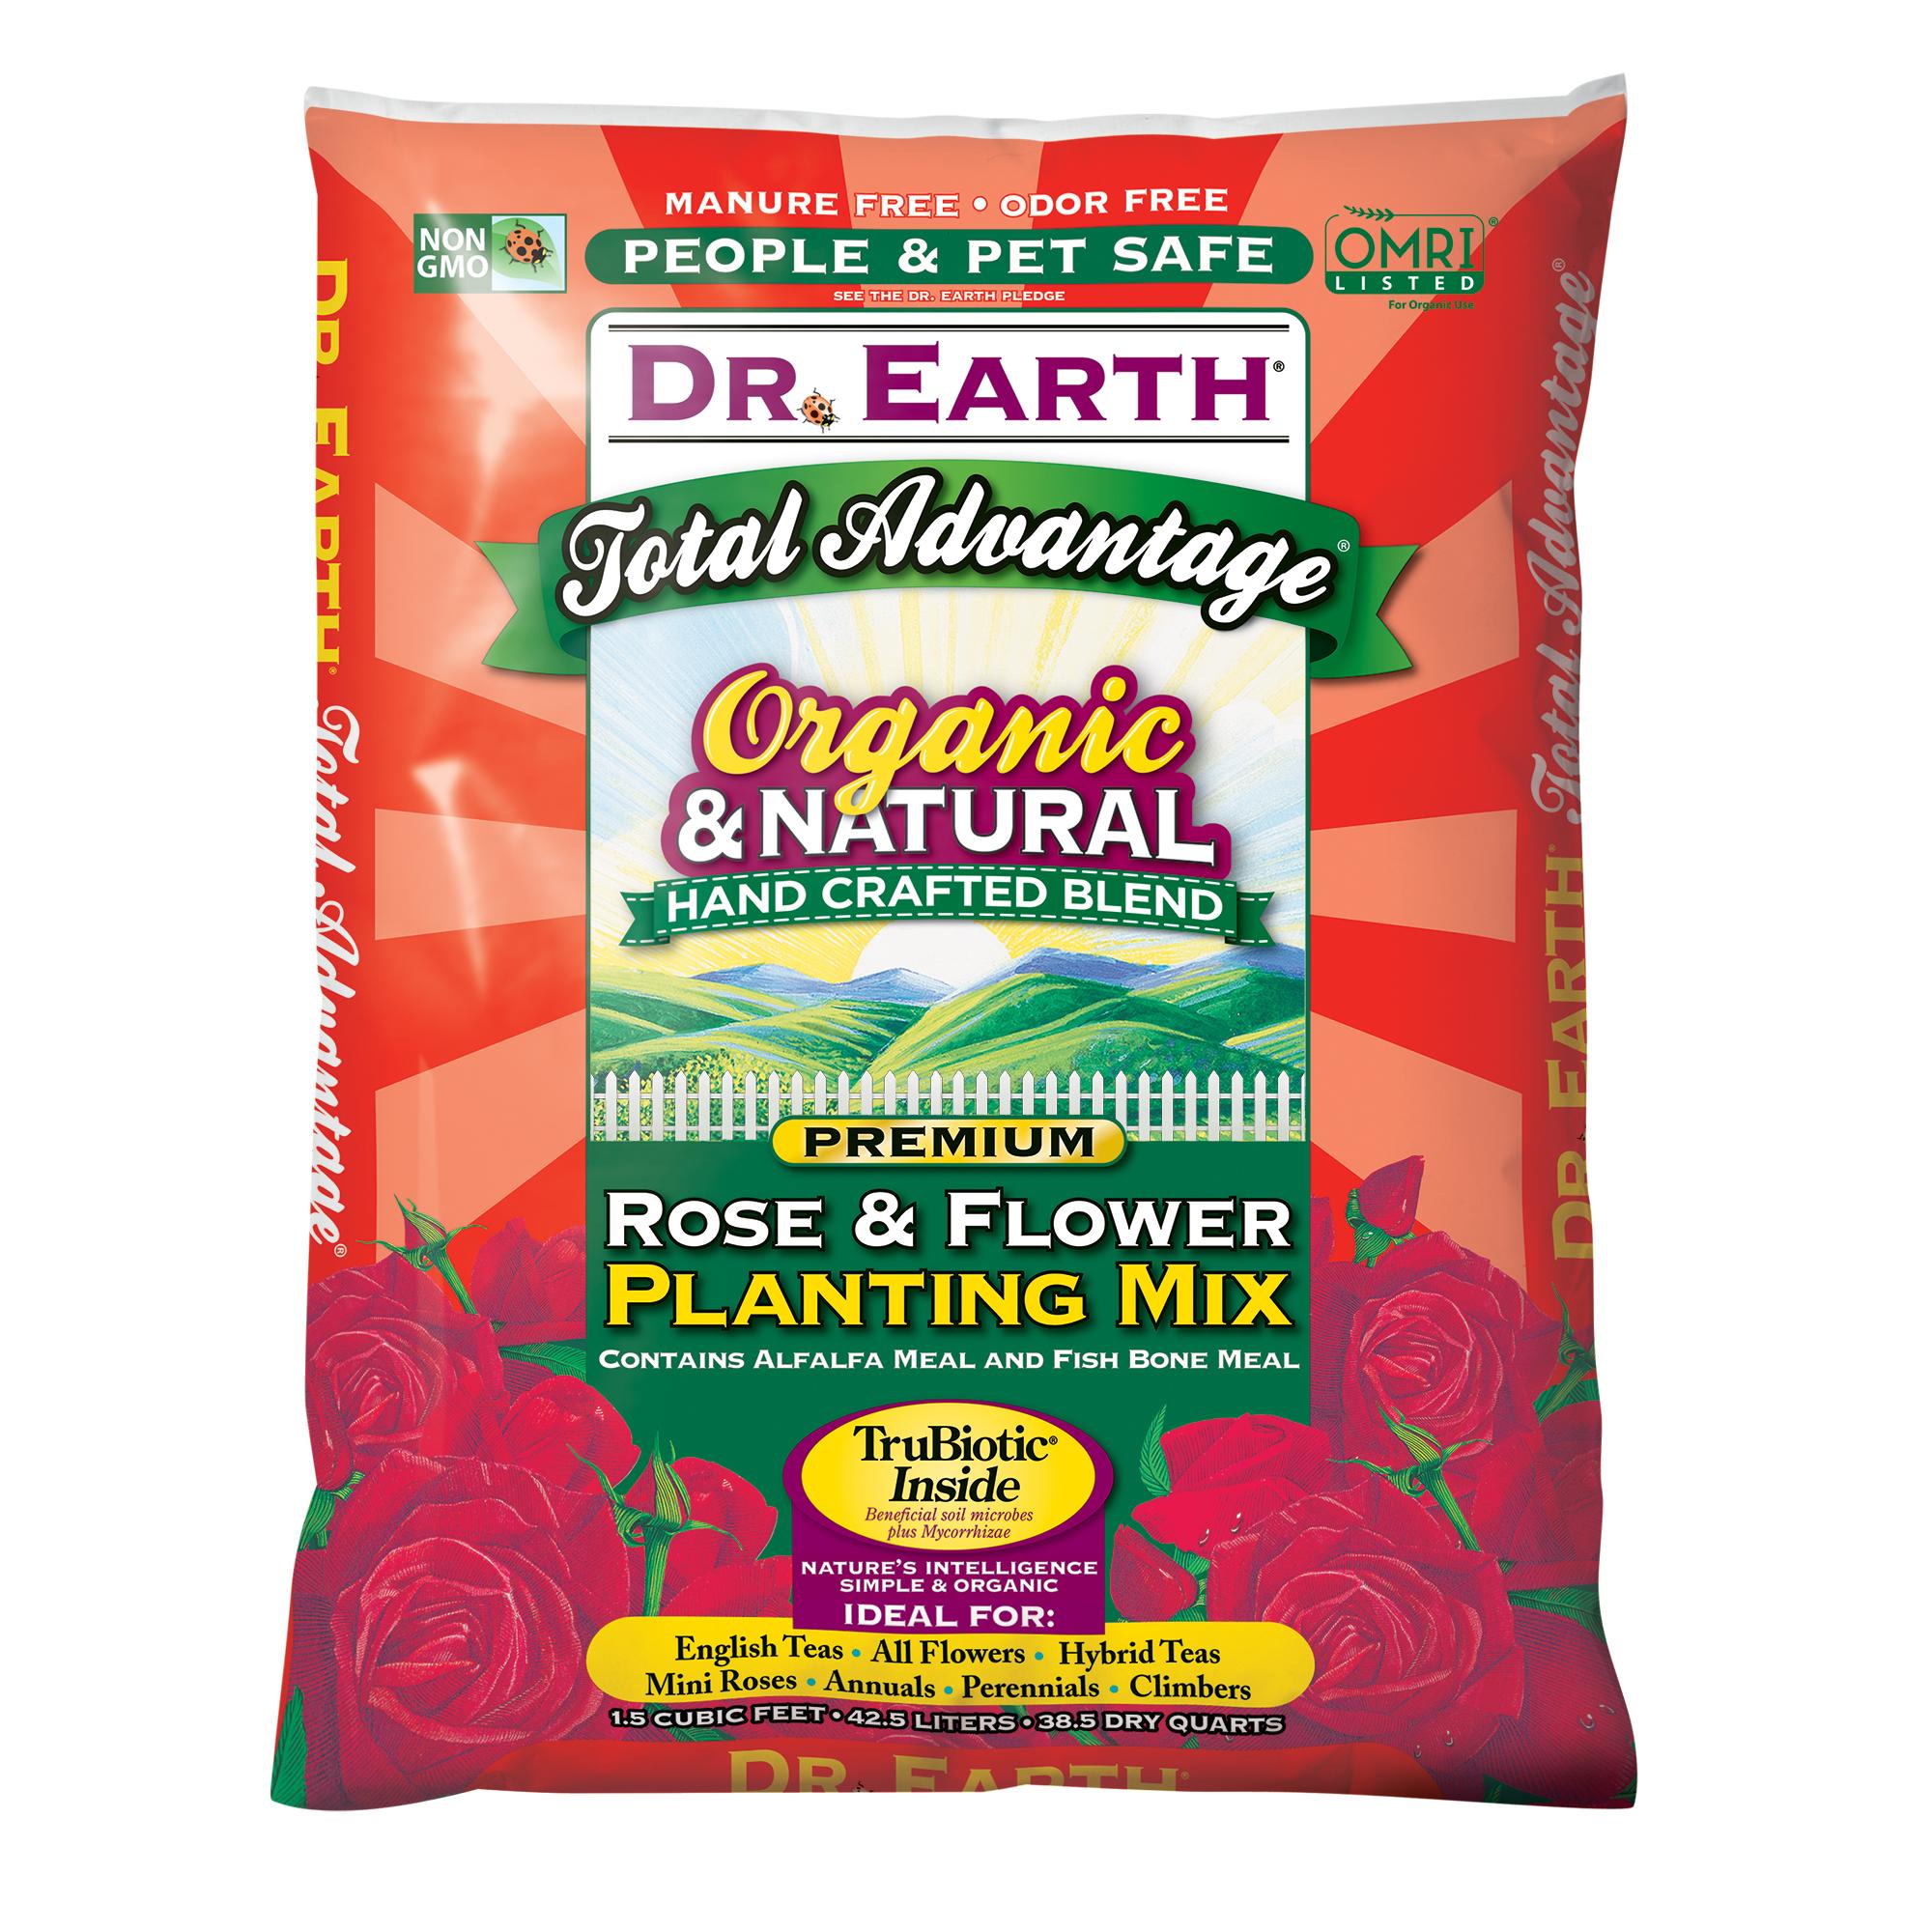 TOTAL ADVANTAGE® ROSE & FLOWER PLANTING MIX